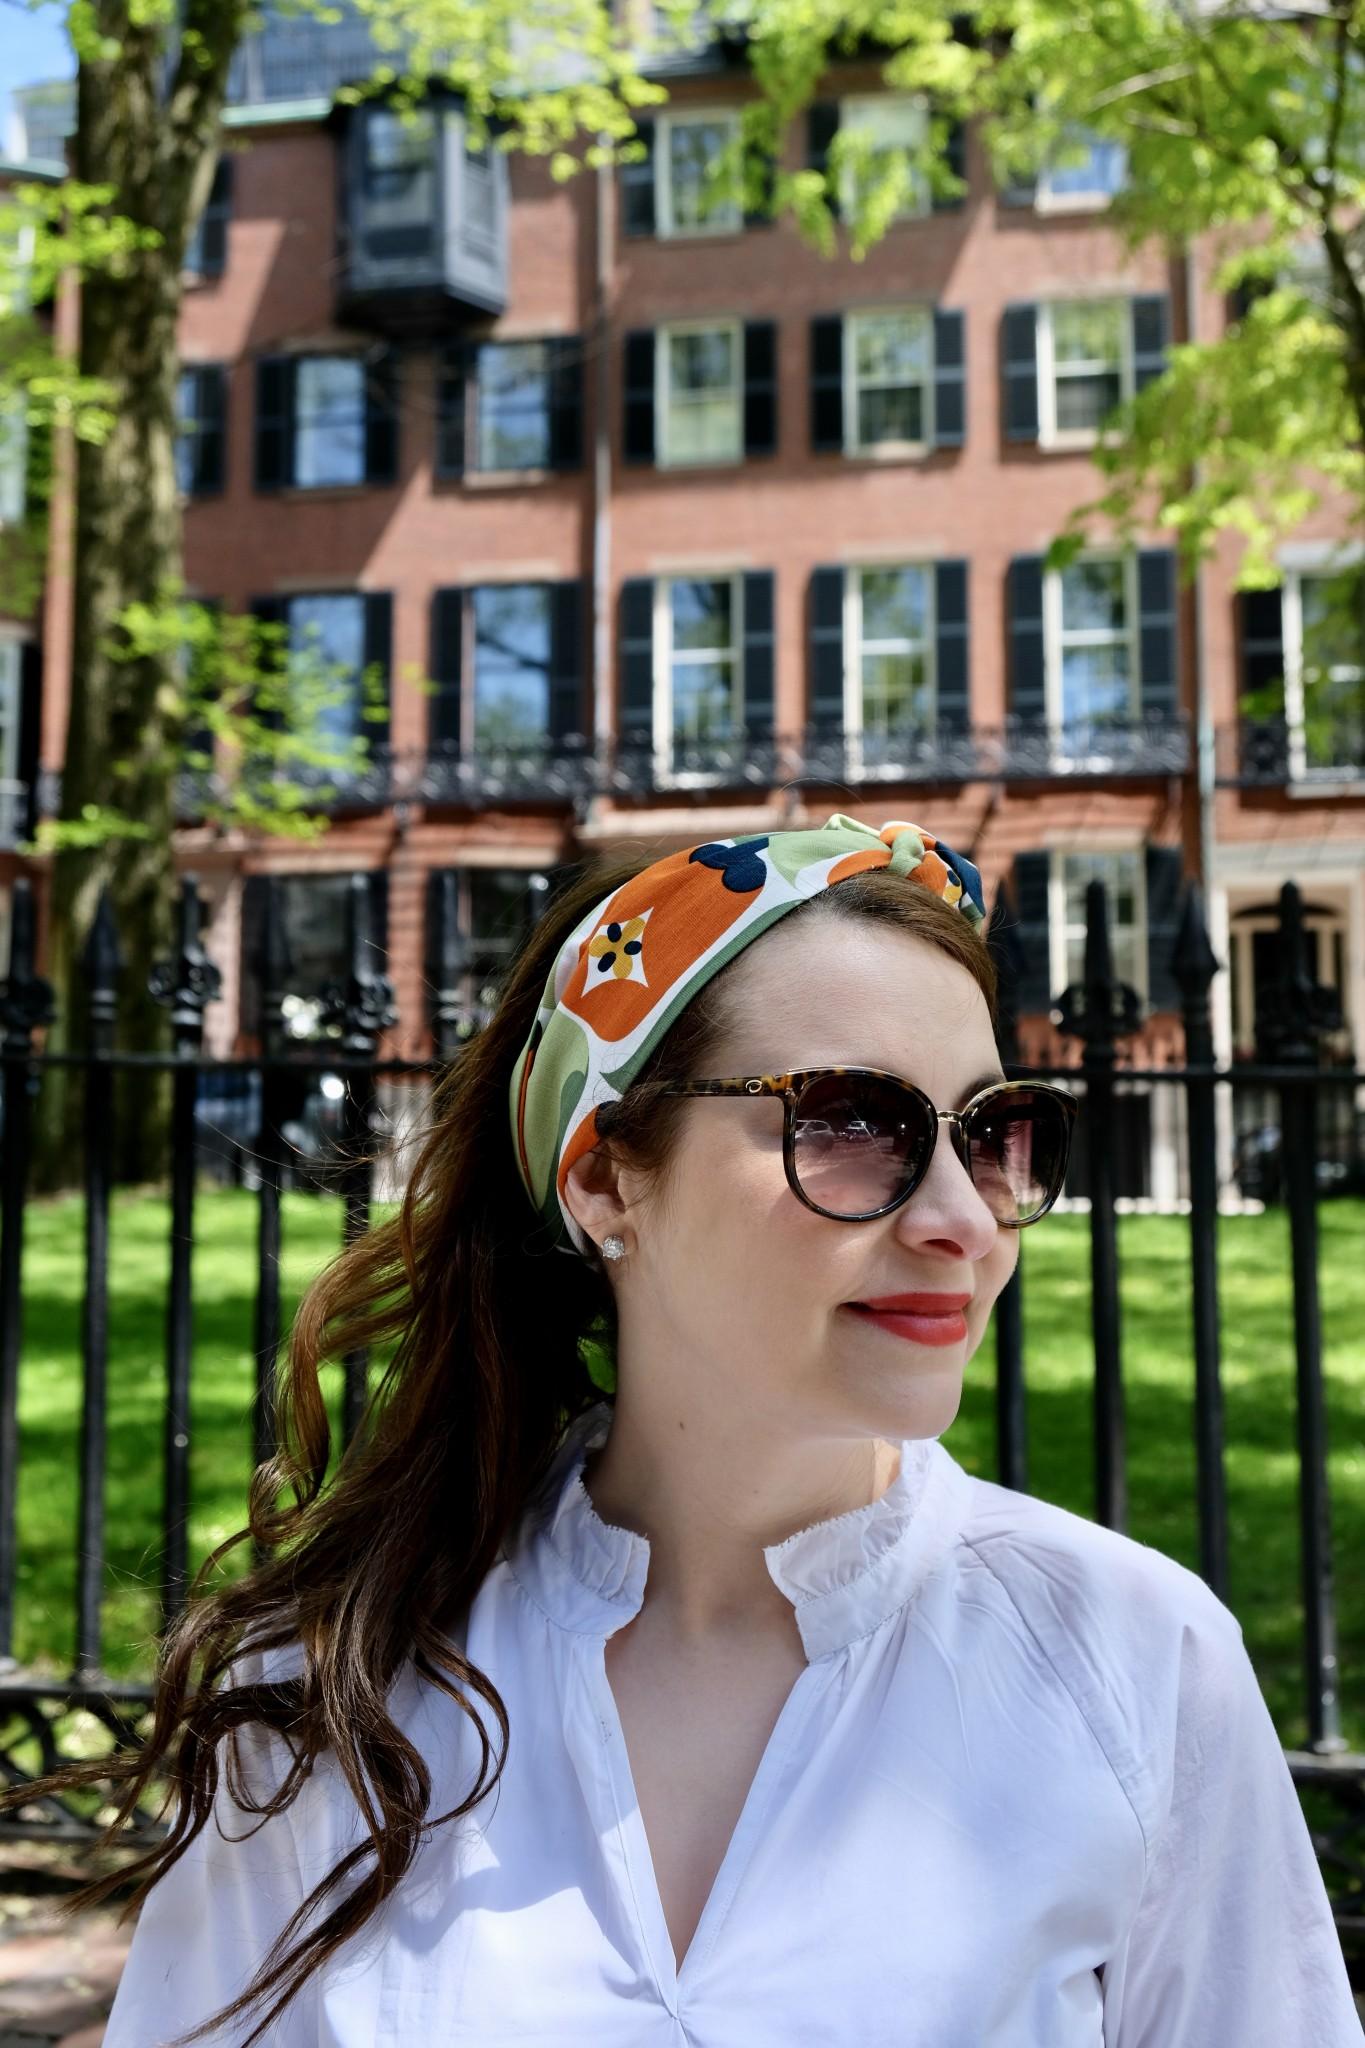 top knot headband, the-alyst.com